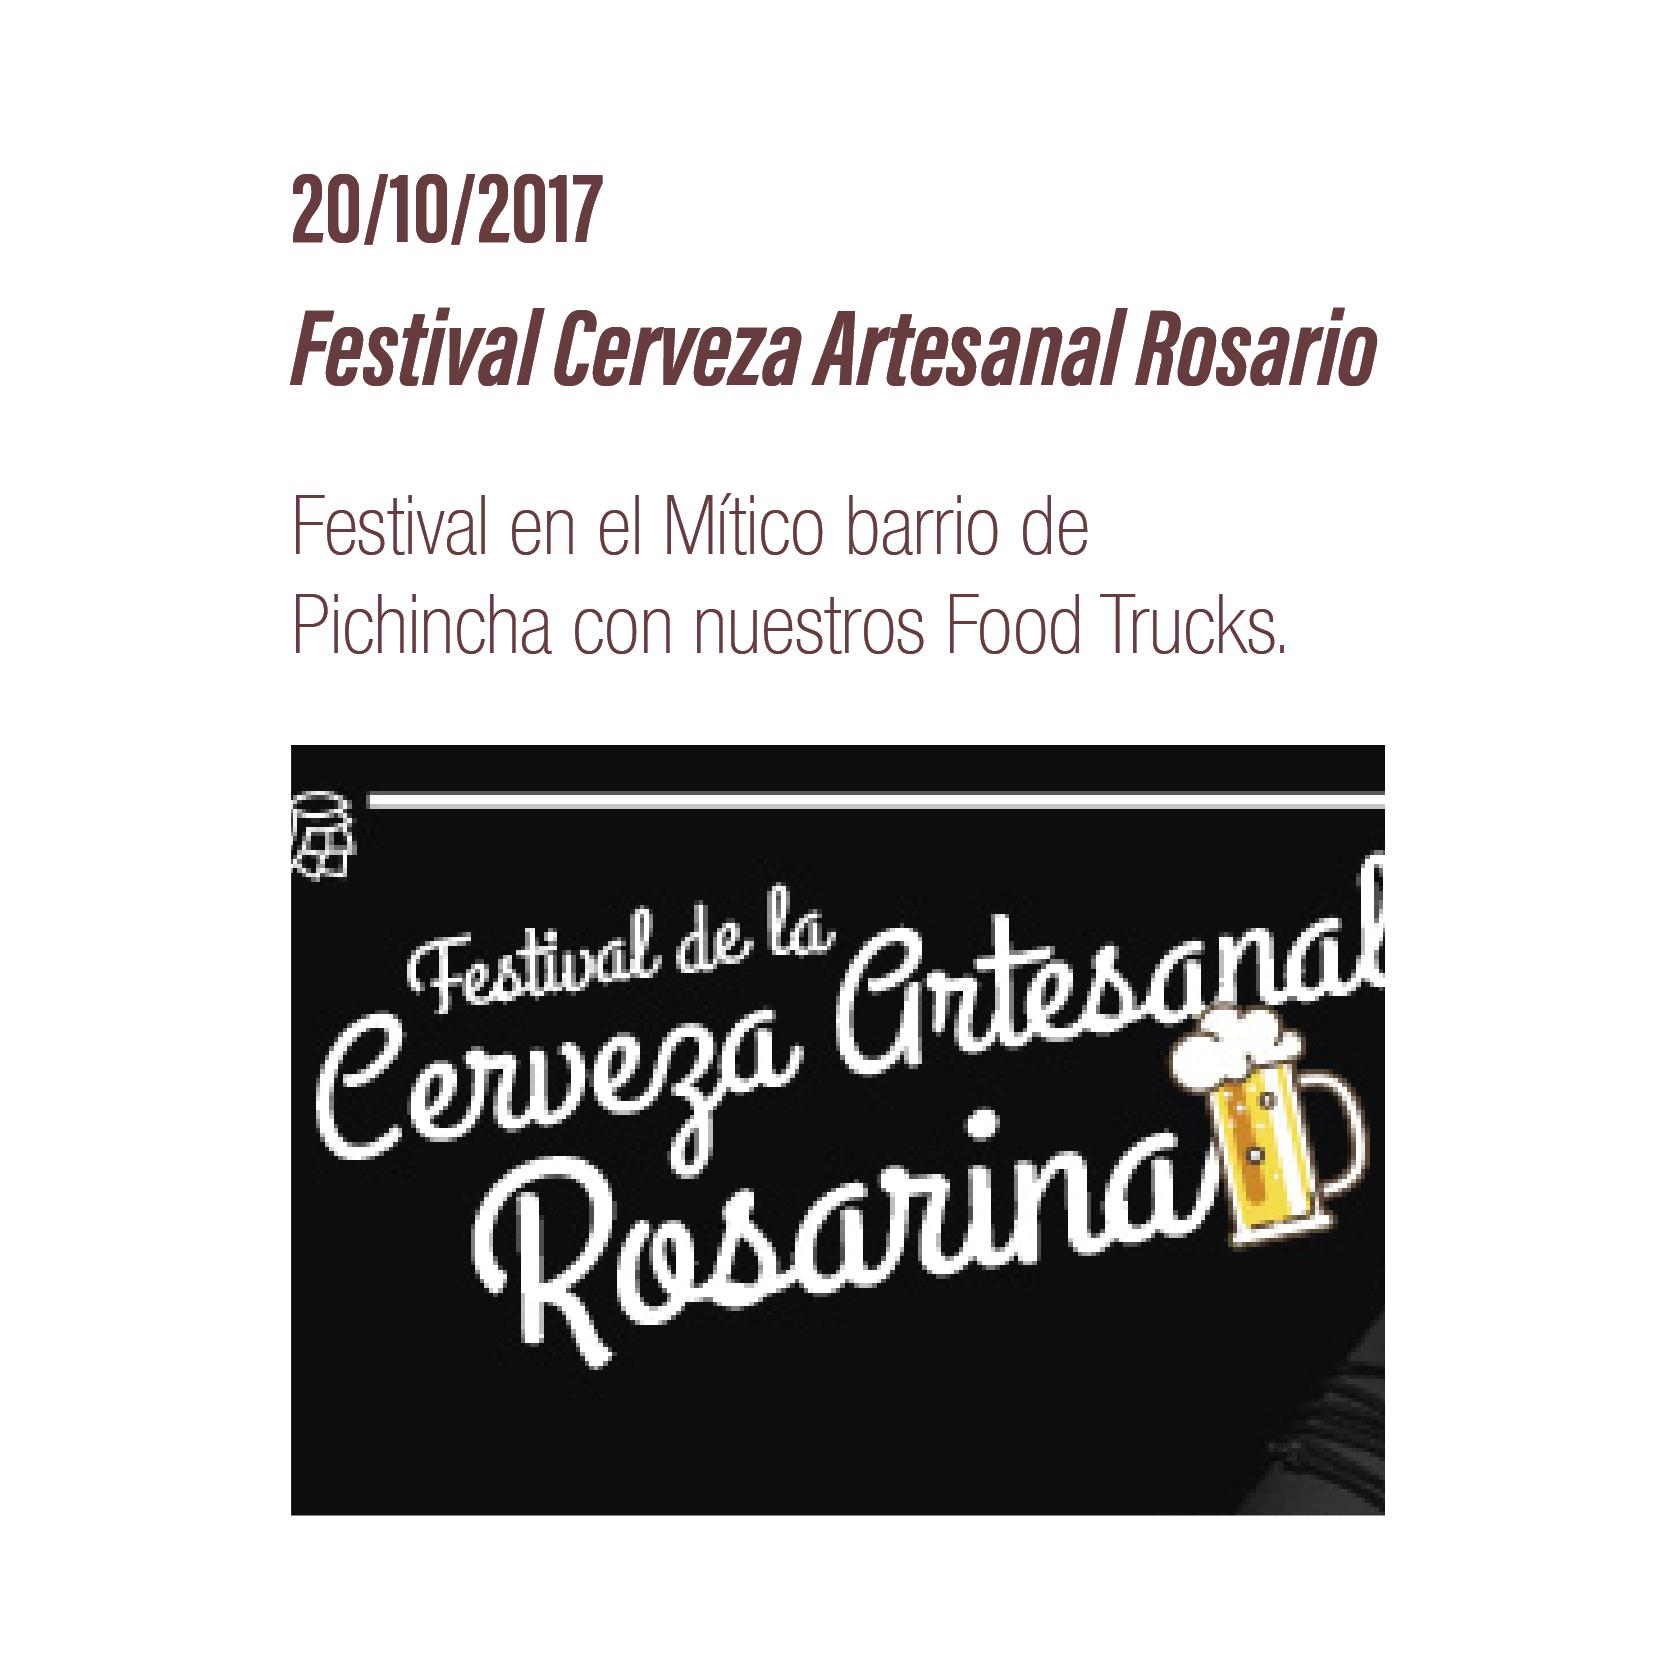 Festival Cerveza Artesanal Rosario